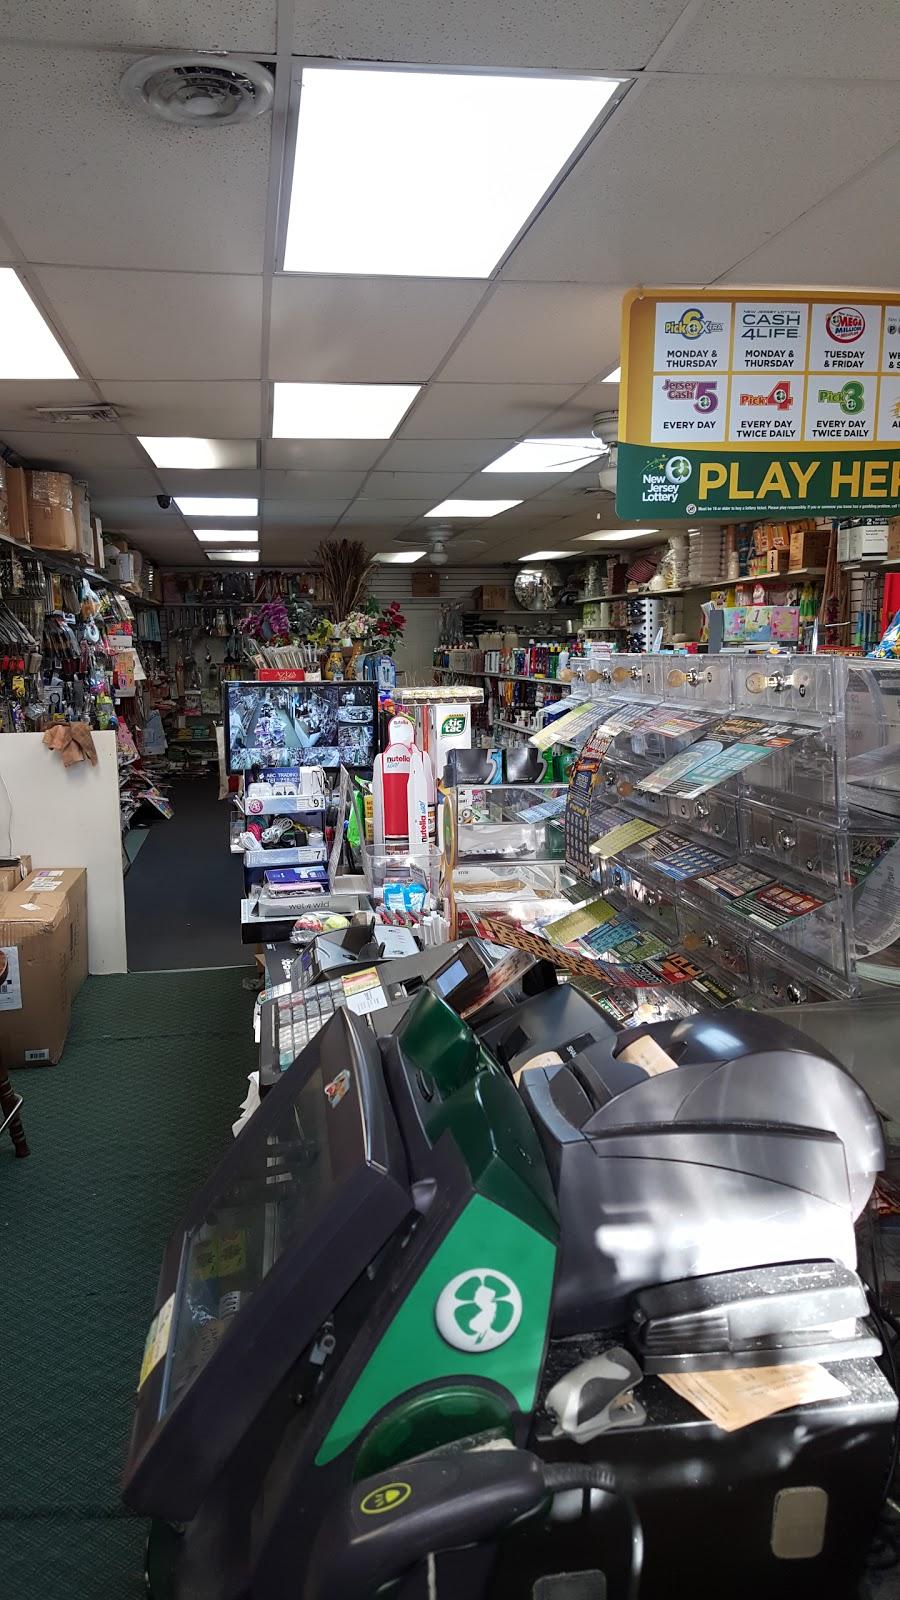 Sunrise Convenience Store - convenience store    Photo 2 of 10   Address: 6905 Bergenline Ave, Guttenberg, NJ 07093, USA   Phone: (201) 854-4324